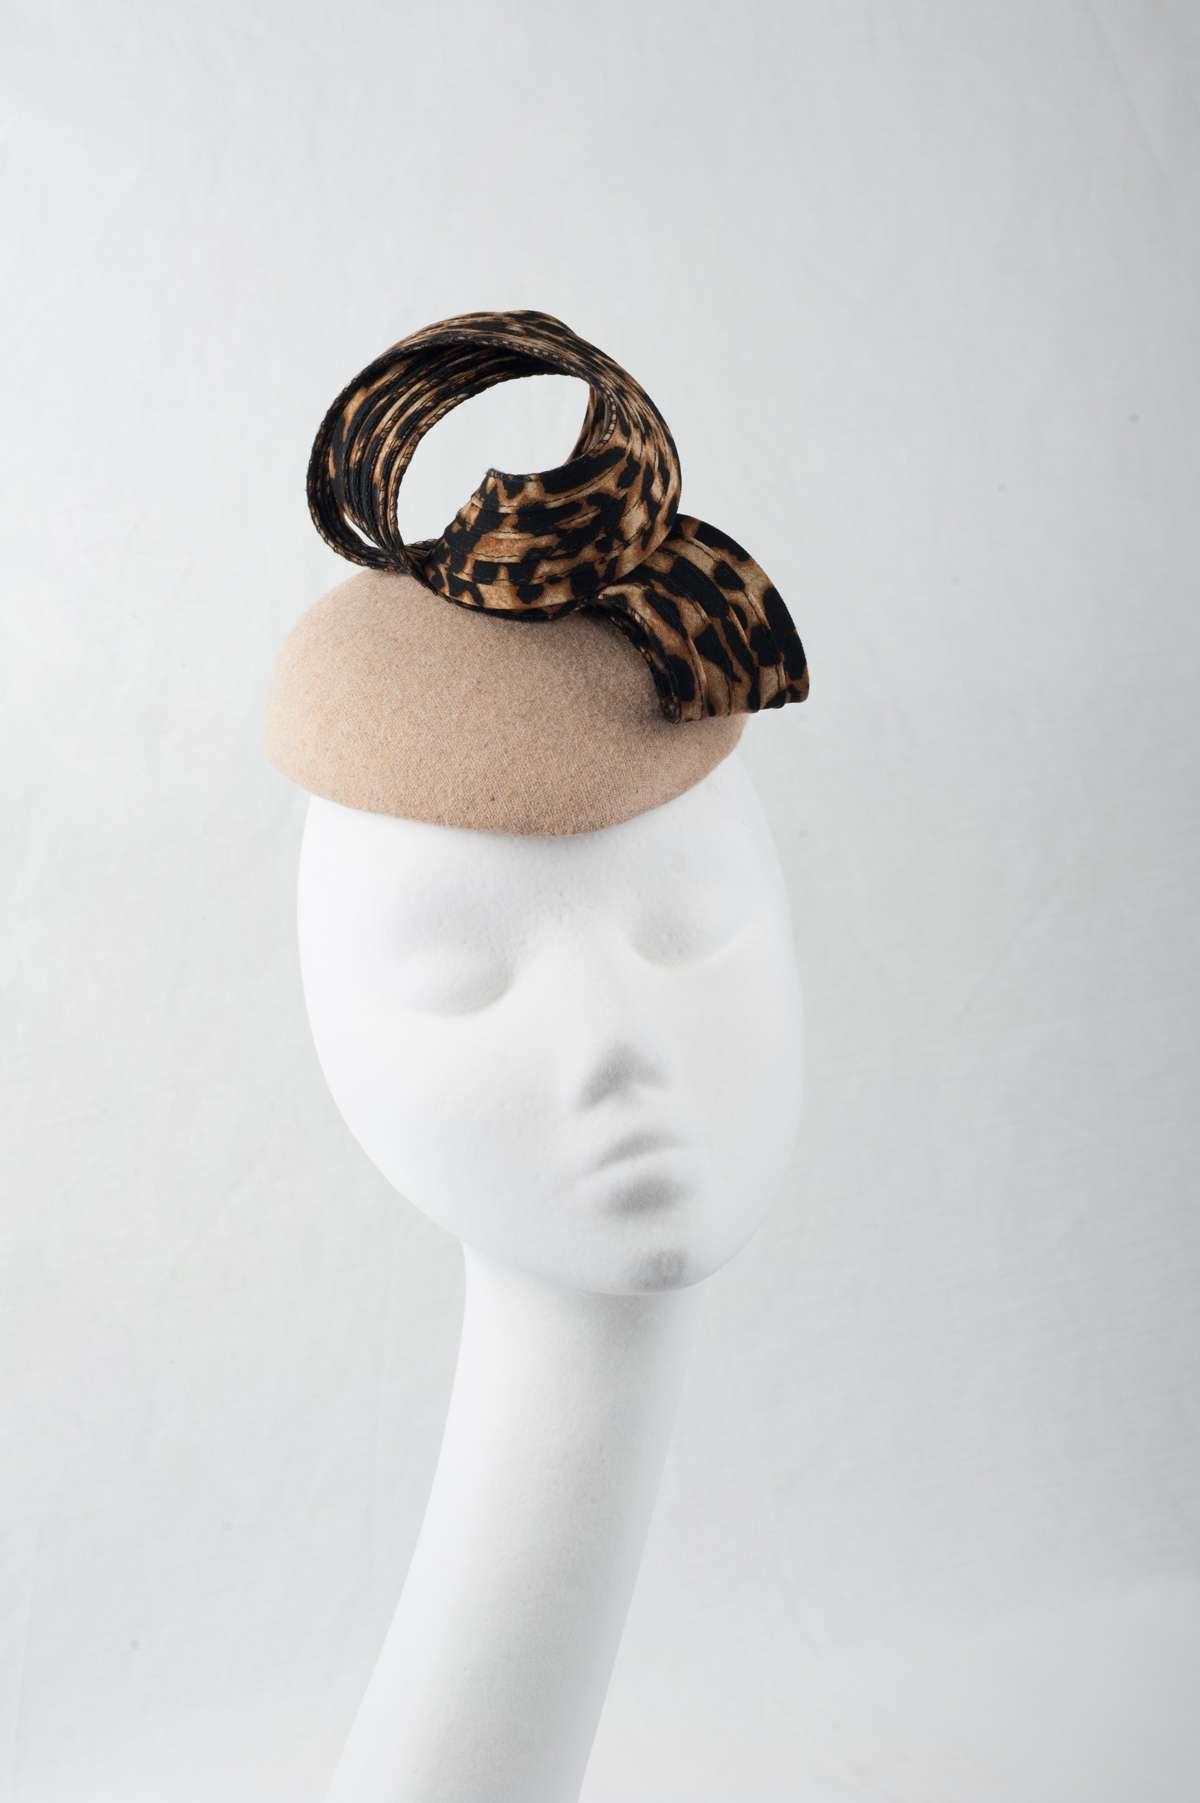 beige & leopard pillbox fascinator - The Hat Box